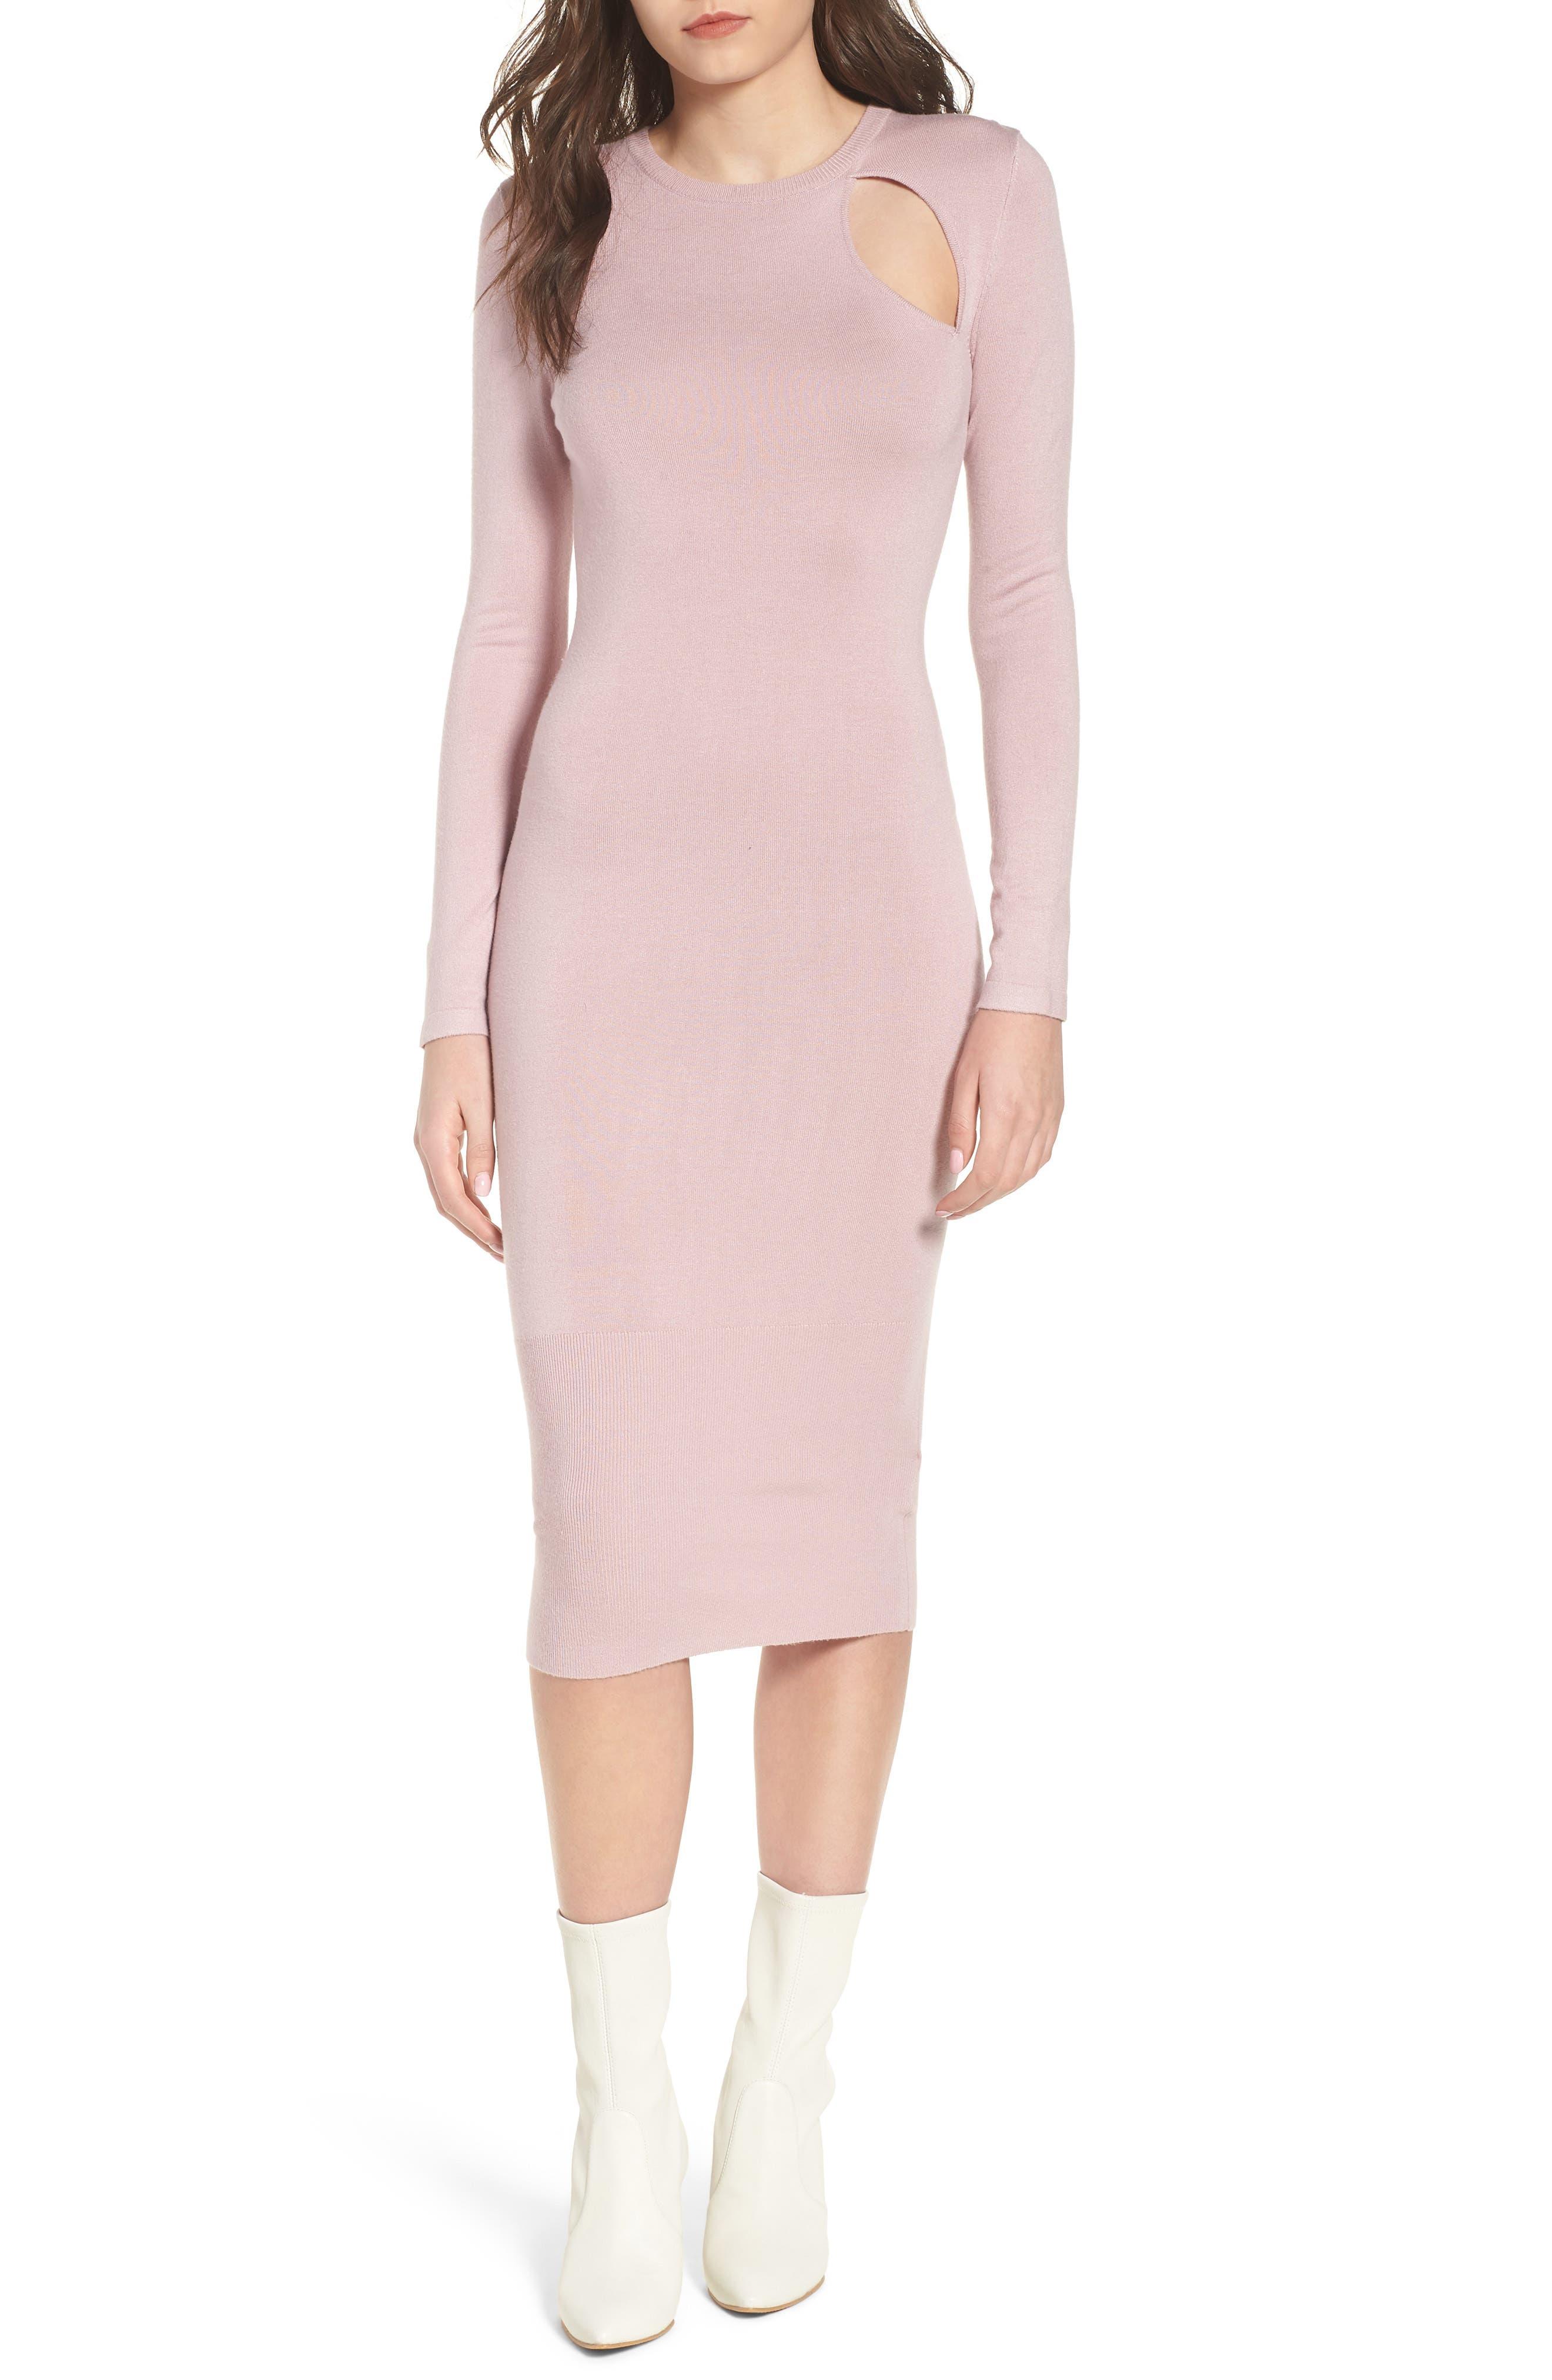 Body-Con Midi Dress,                             Main thumbnail 1, color,                             650